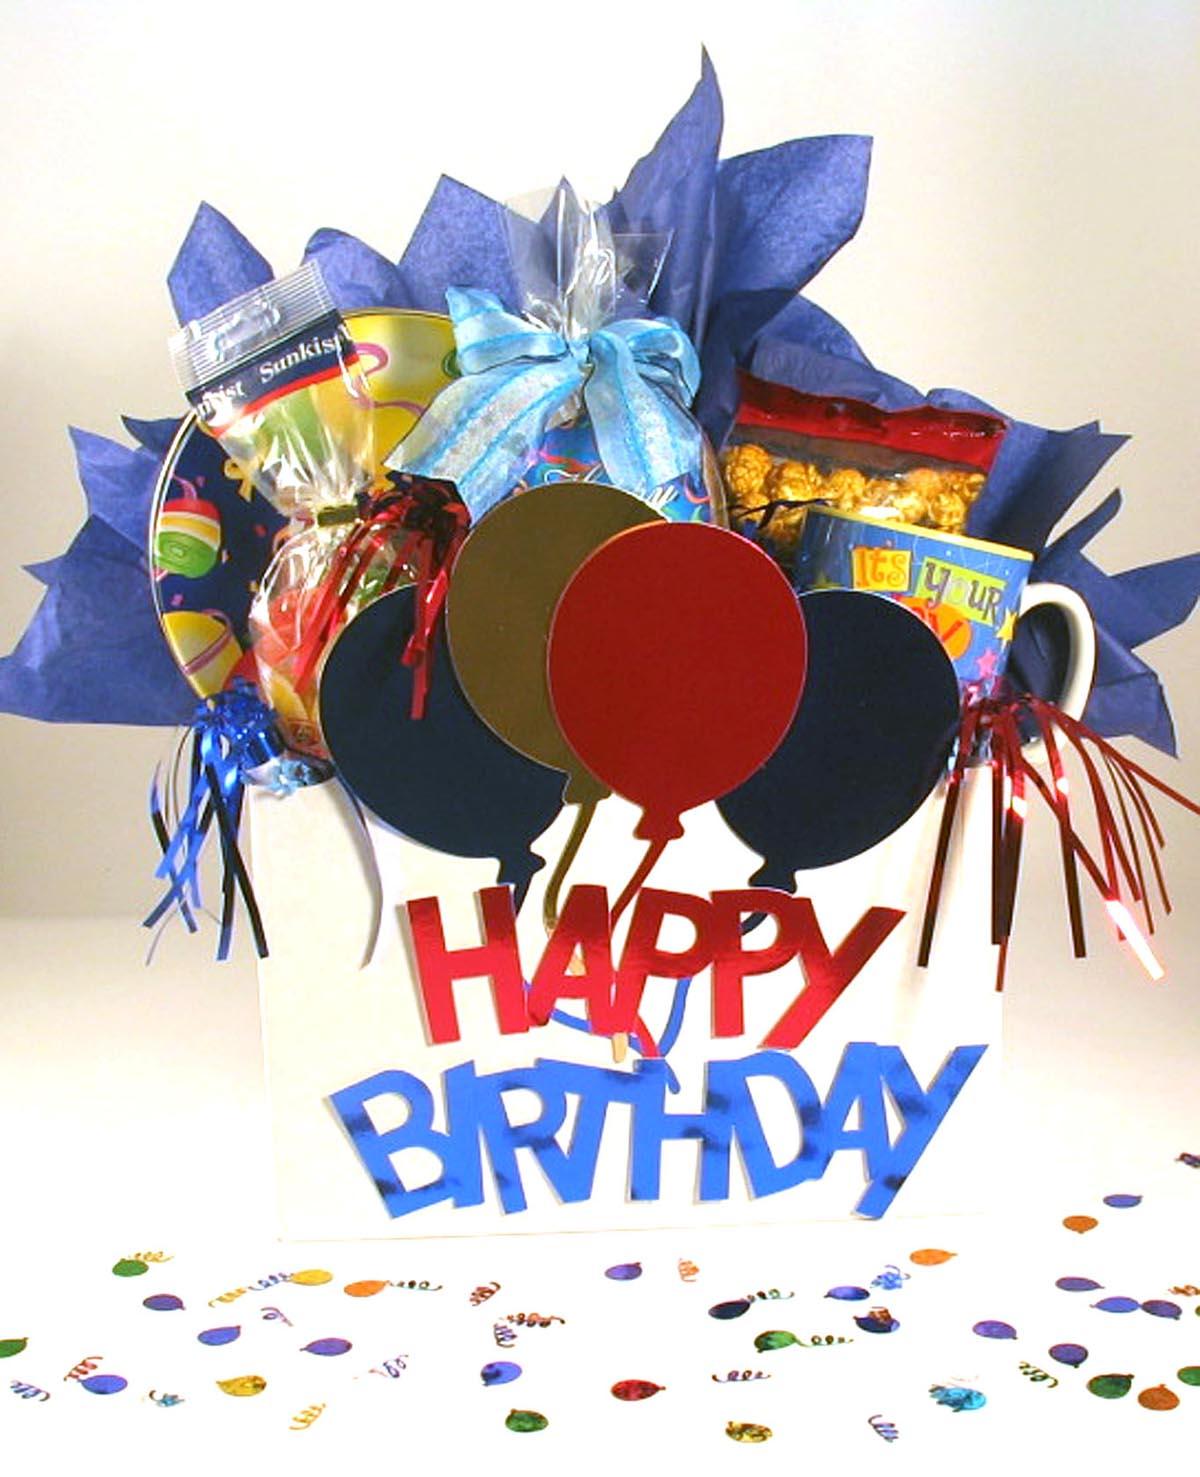 Happy Birthday, Cheiry~ Here's